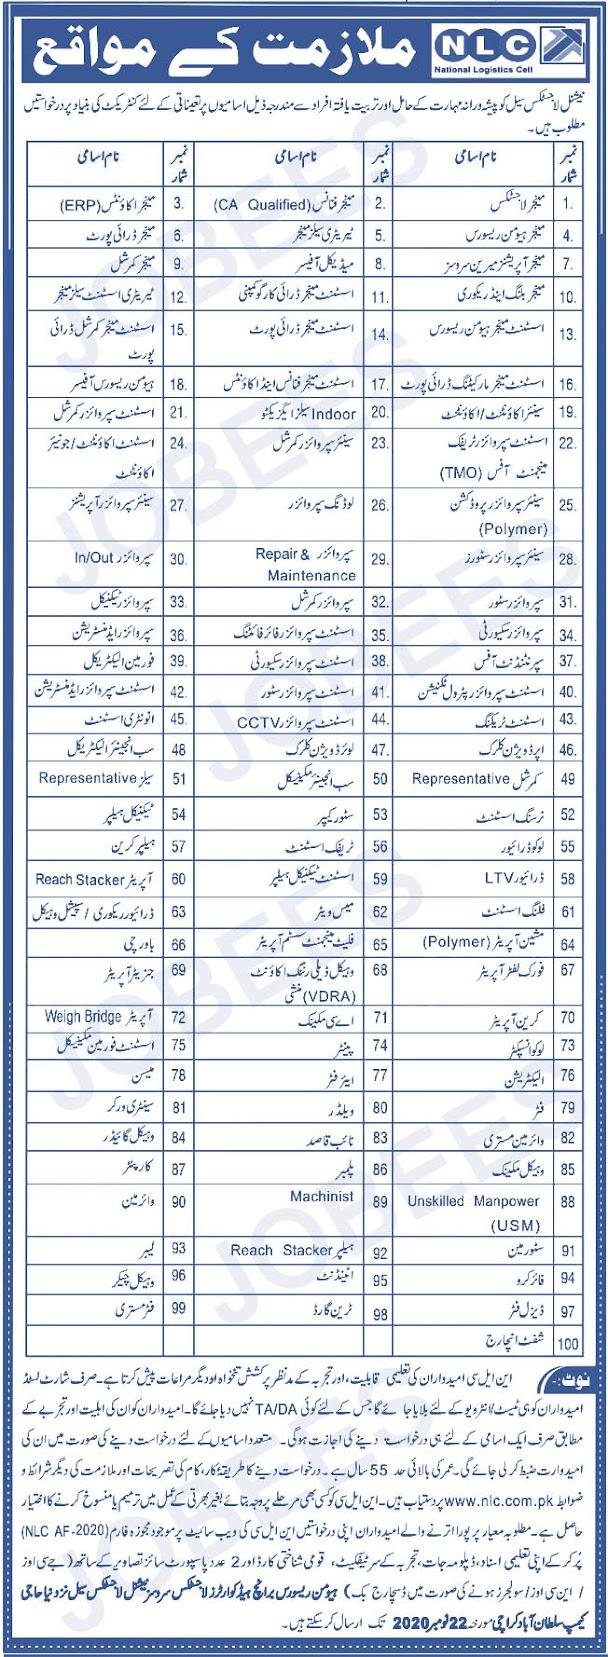 National Logistic Cell NLC Karachi 2020